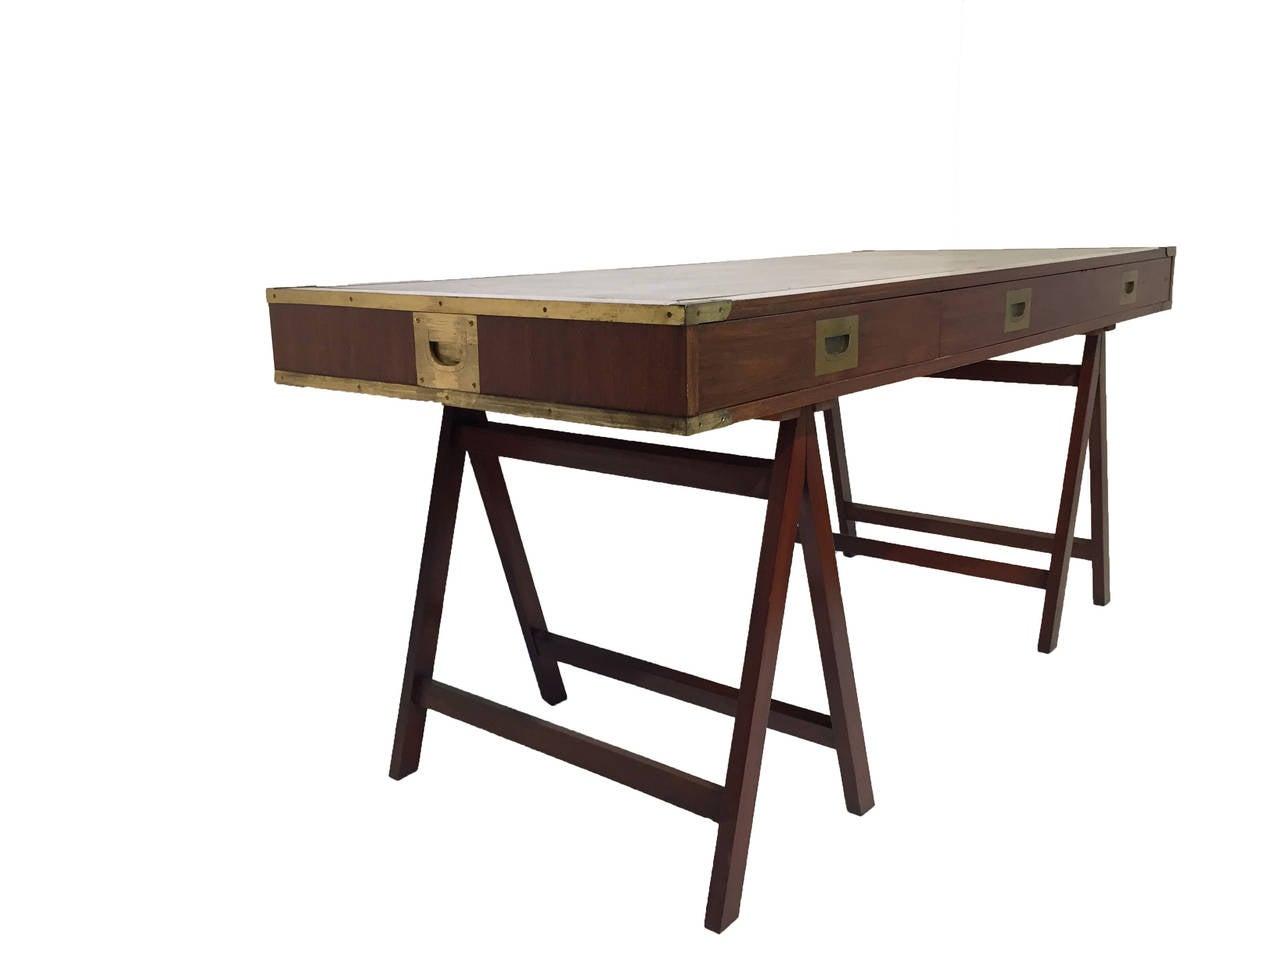 japanese writing desk Oak classical 1900 antique writing desk or library table, fluted legs $995 midcentury modern 1960 vintage mahogany scandinavian cabinet desk $1,975.